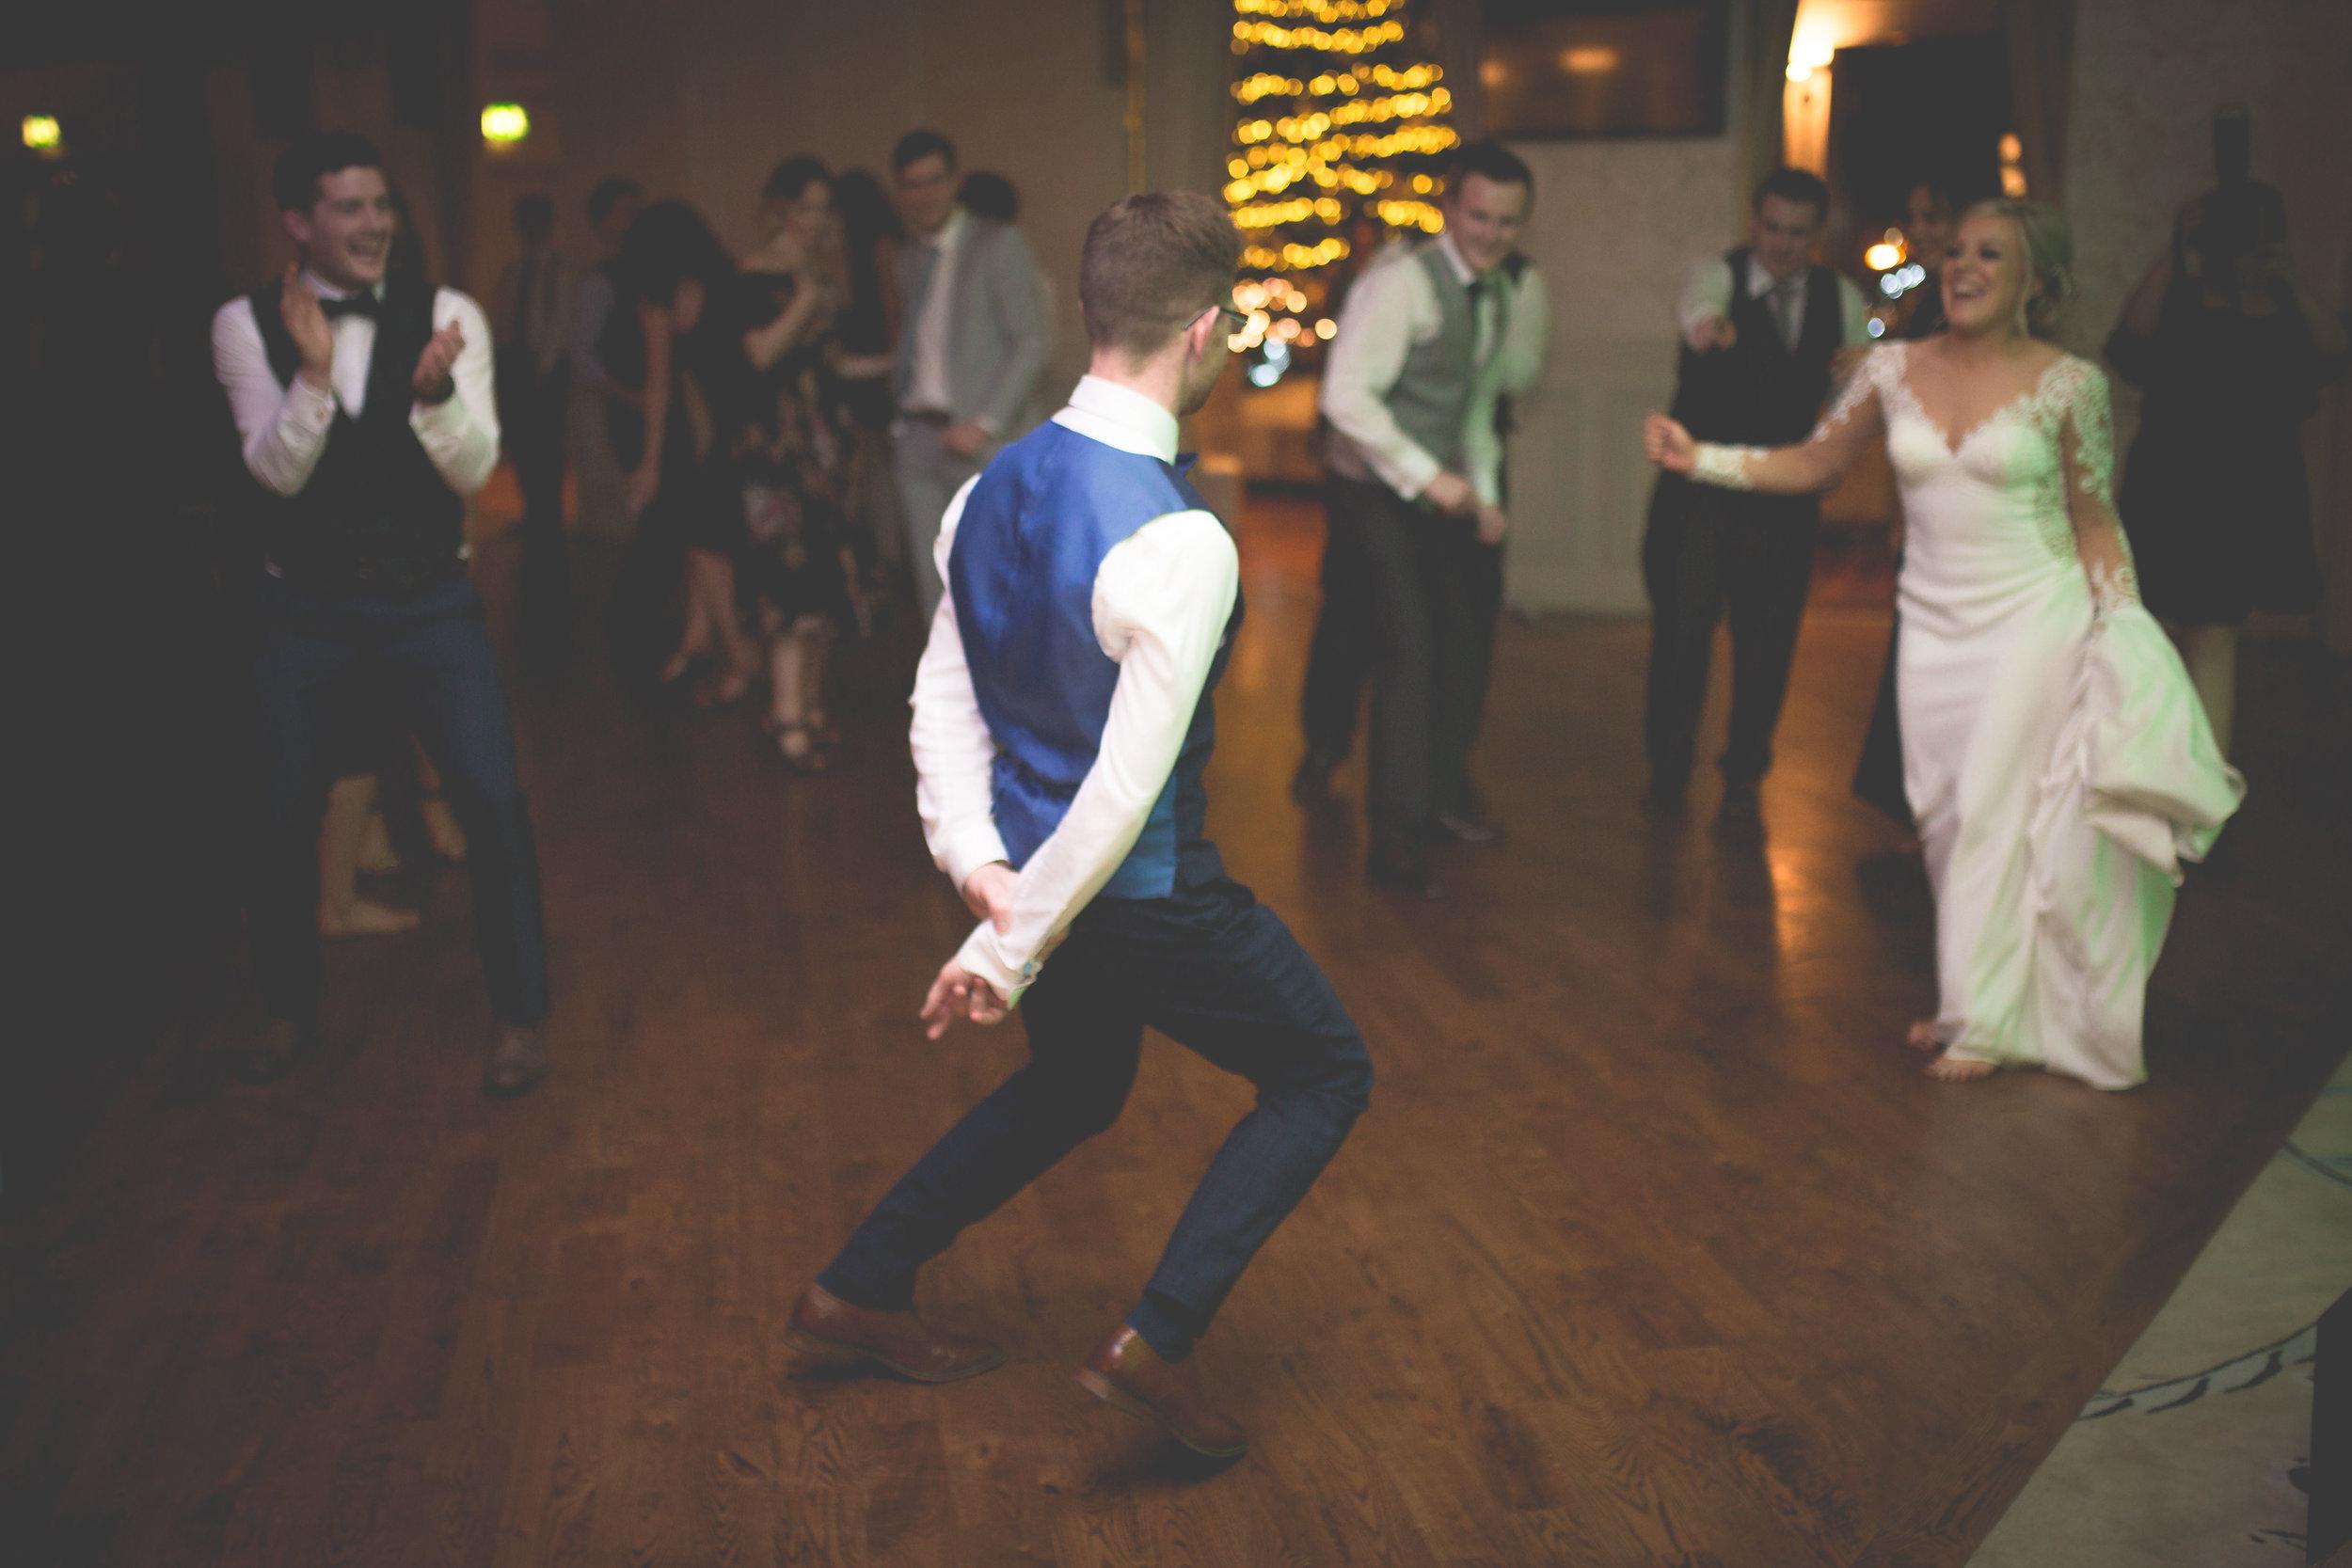 MaryJo_Conor_Mageean_Dancing-15.jpg